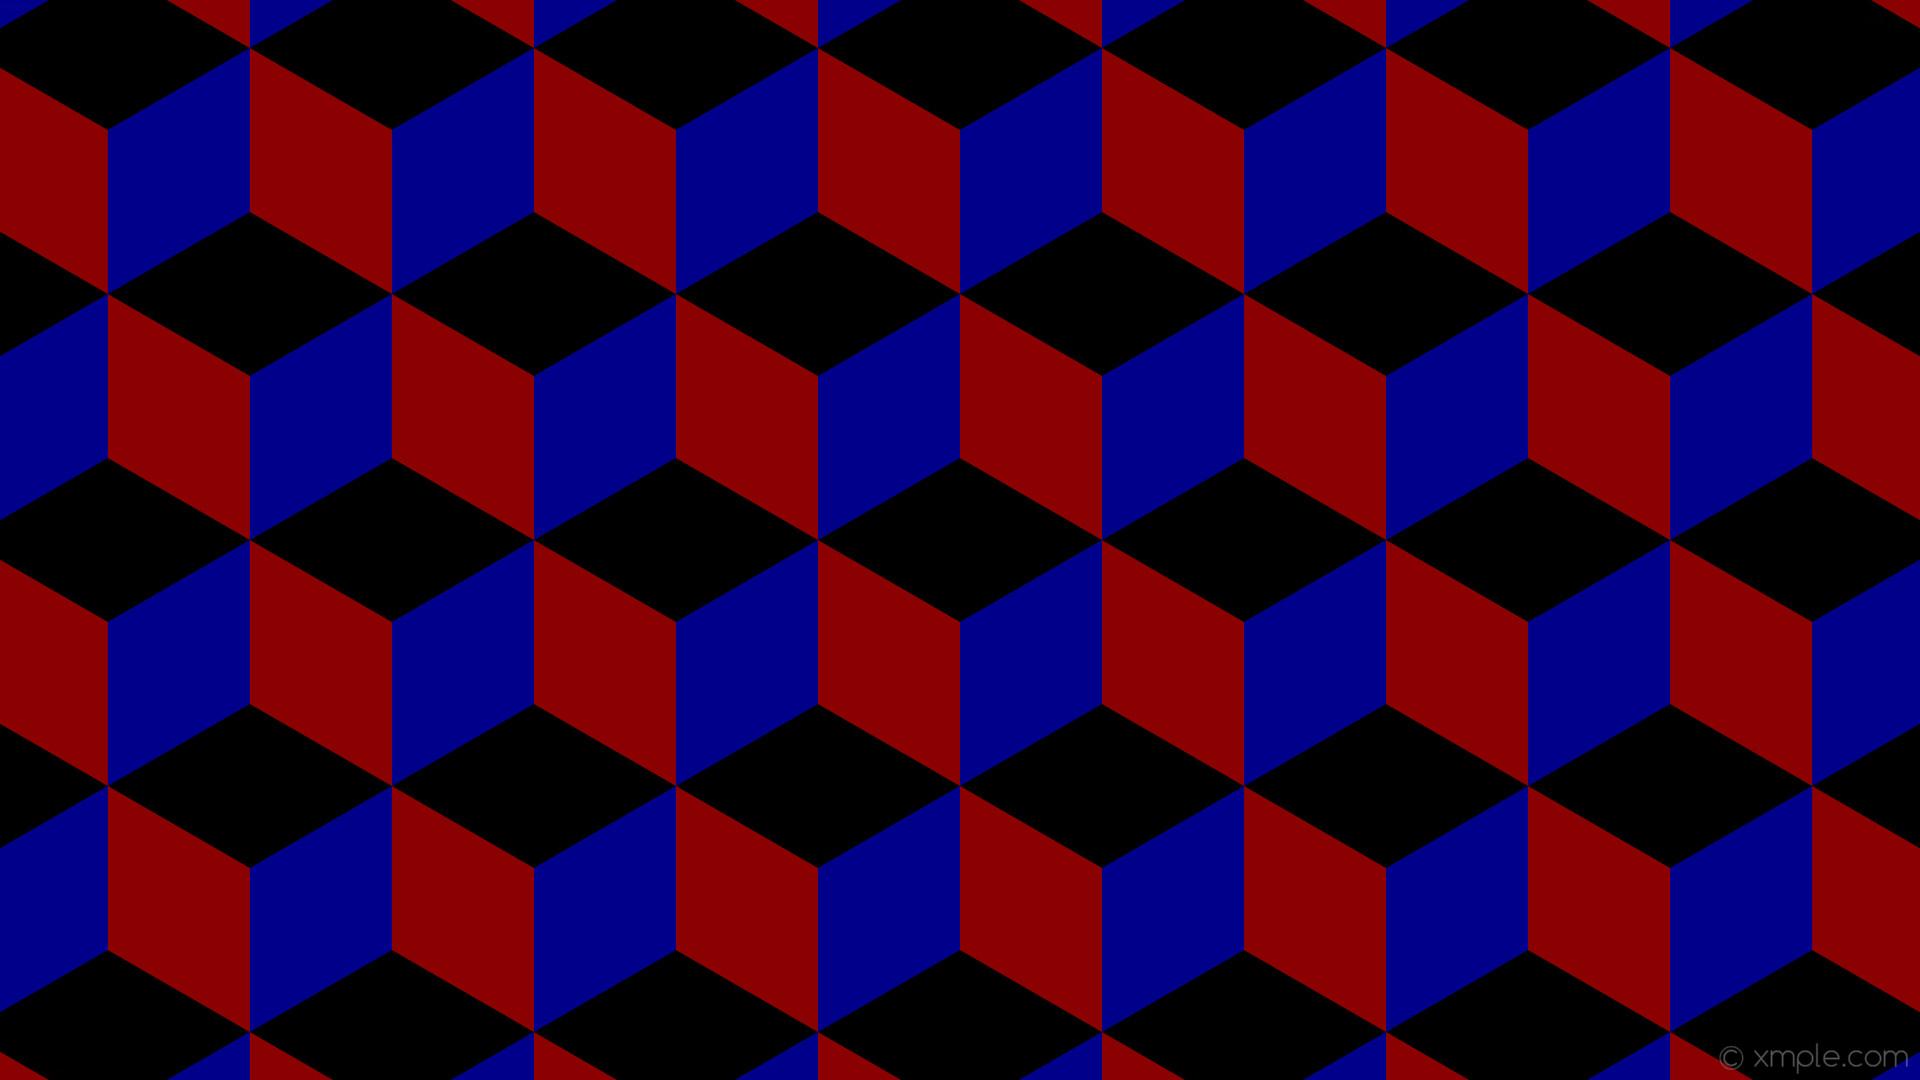 wallpaper red 3d cubes blue black dark red dark blue #000000 #8b0000 #00008b